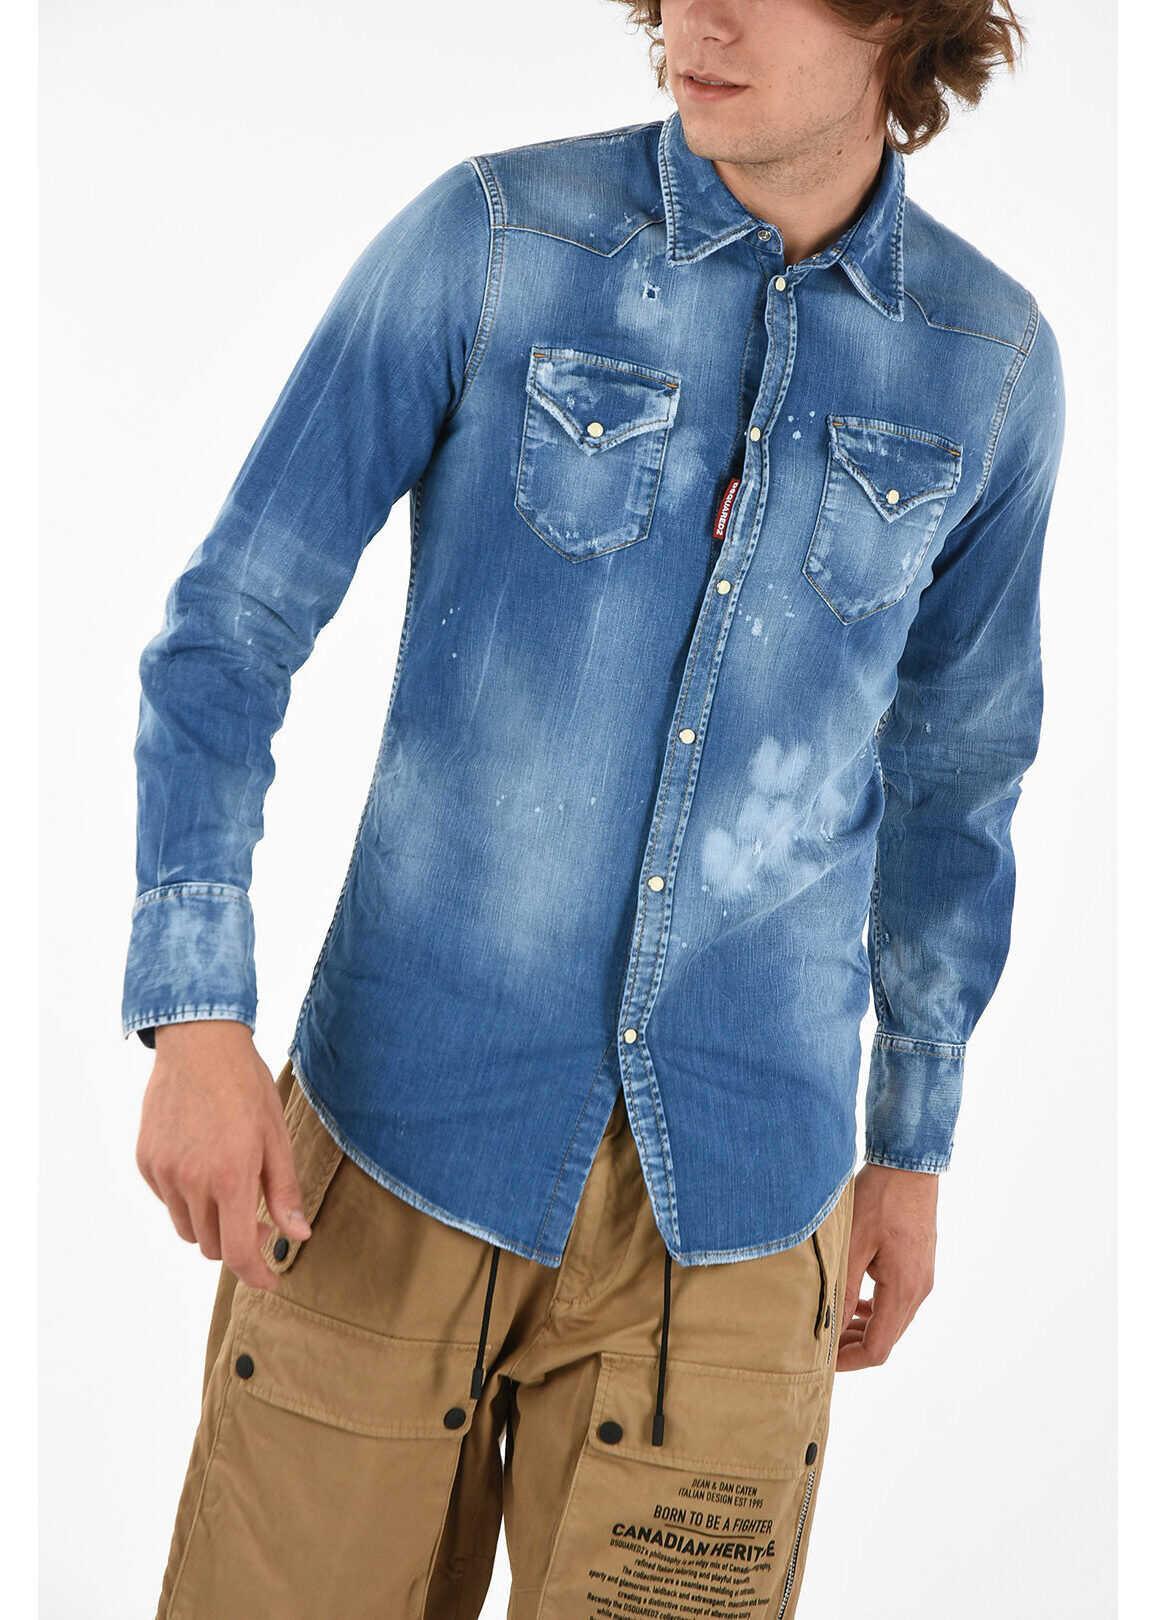 DSQUARED2 Denim CLASSIC WESTERN FIT Shirt BLUE imagine